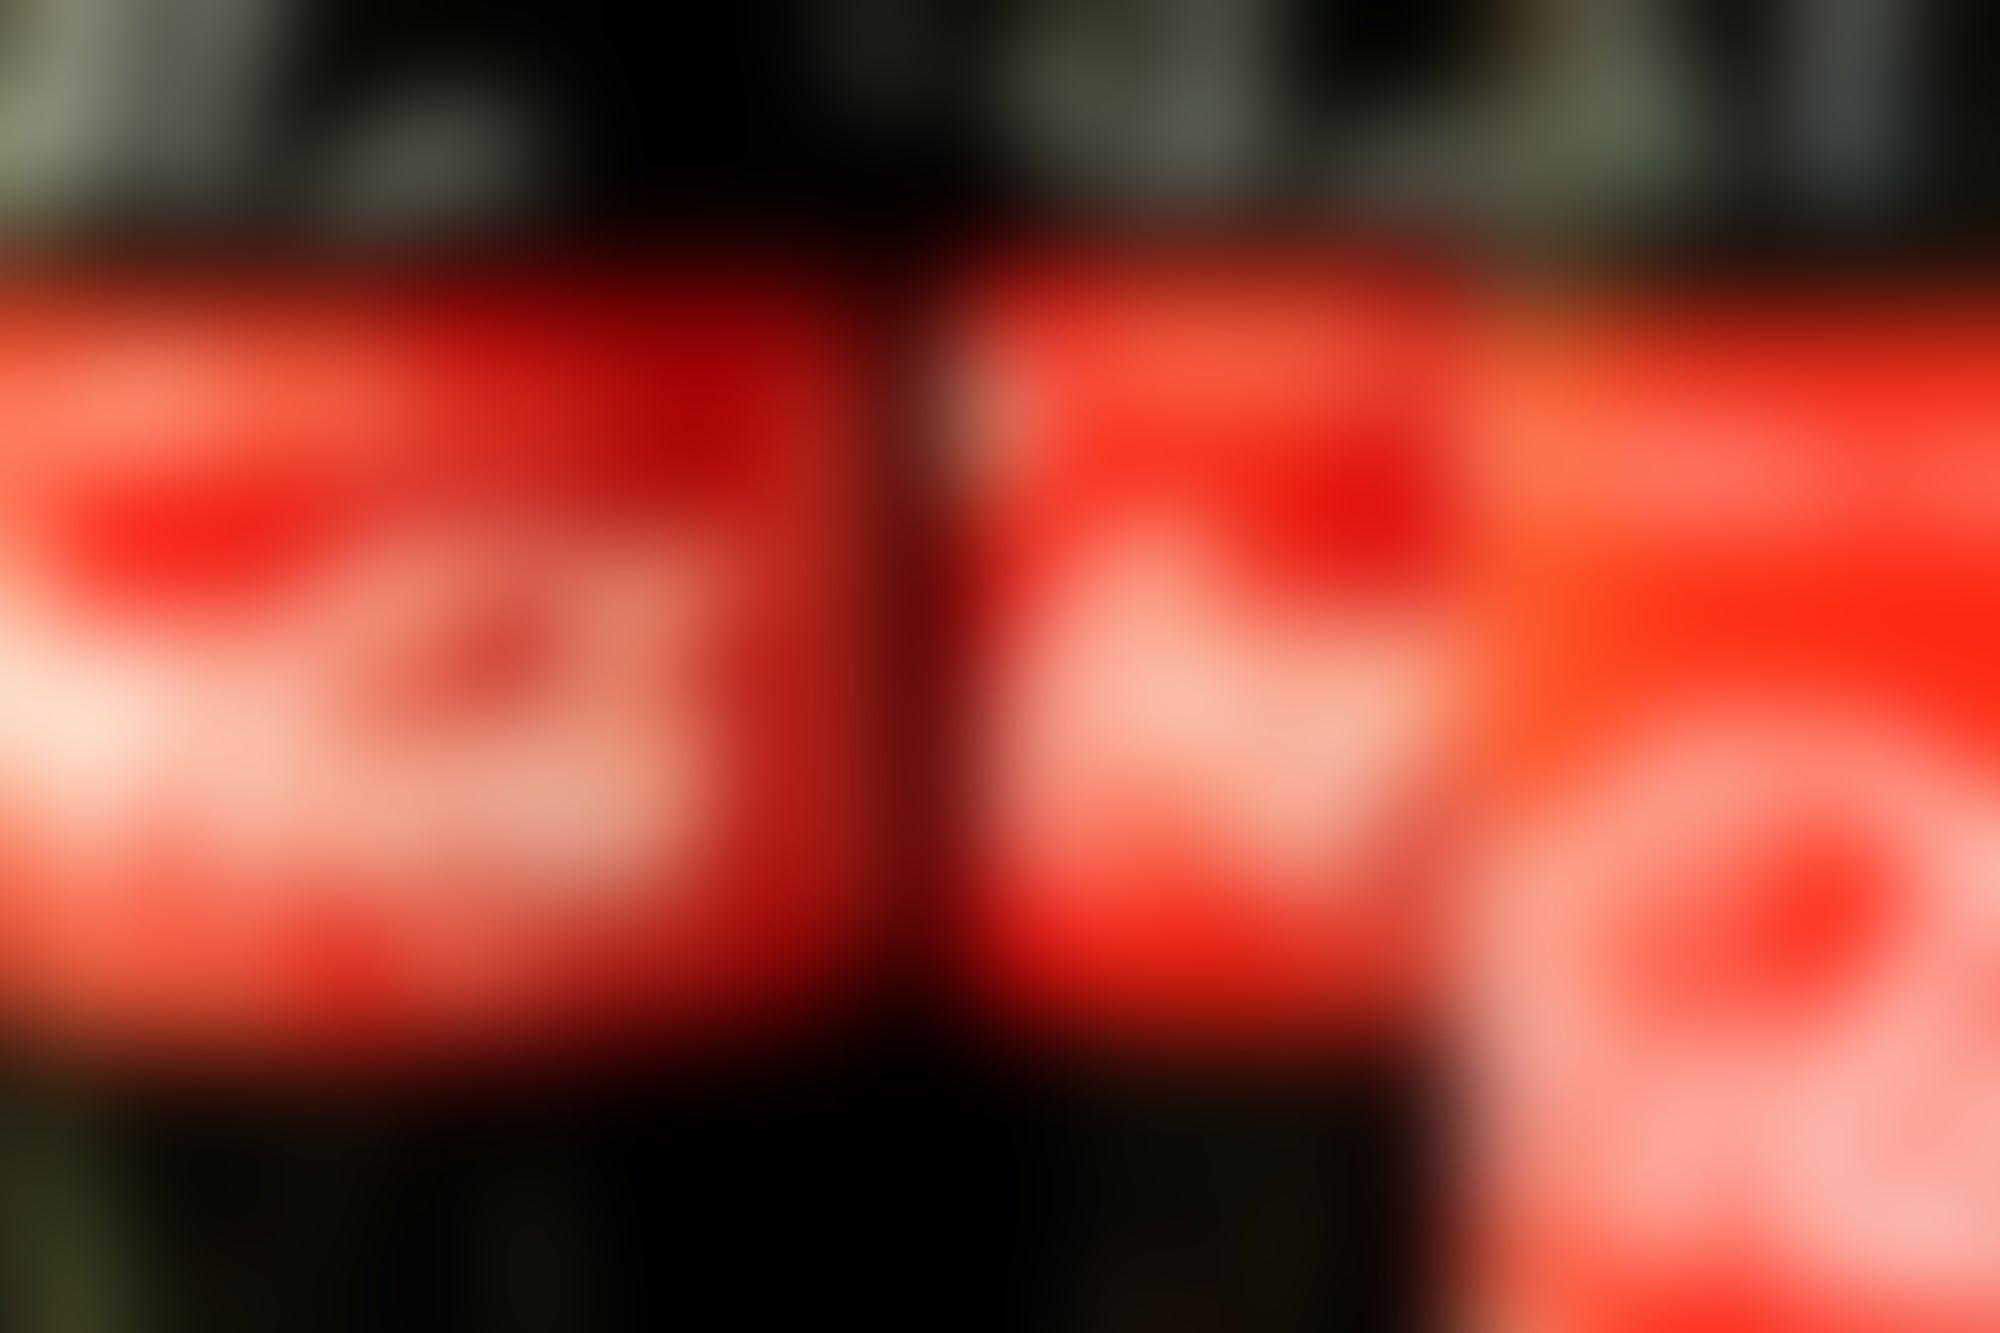 Coca-Cola Is 'In Talks' to Make Marijuana-Infused Drinks